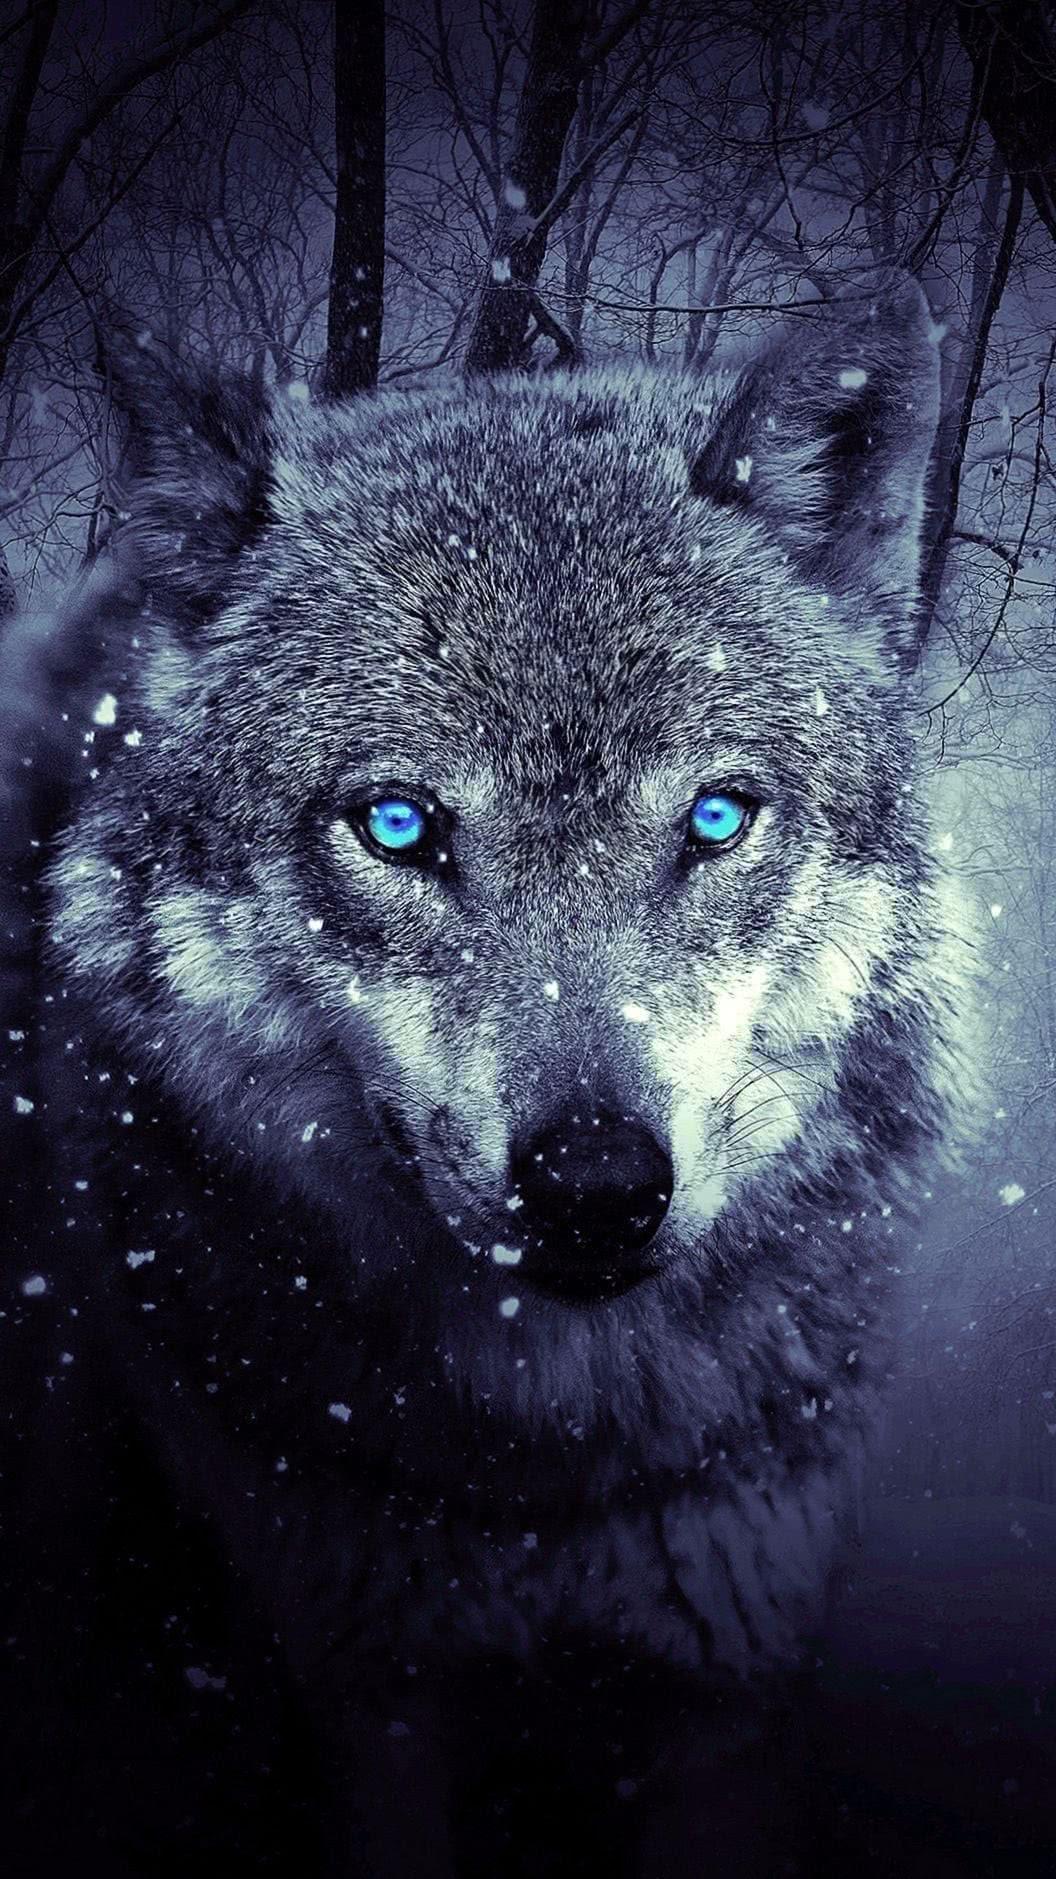 Wallpaper iPhone 6 Plus HD Wolf